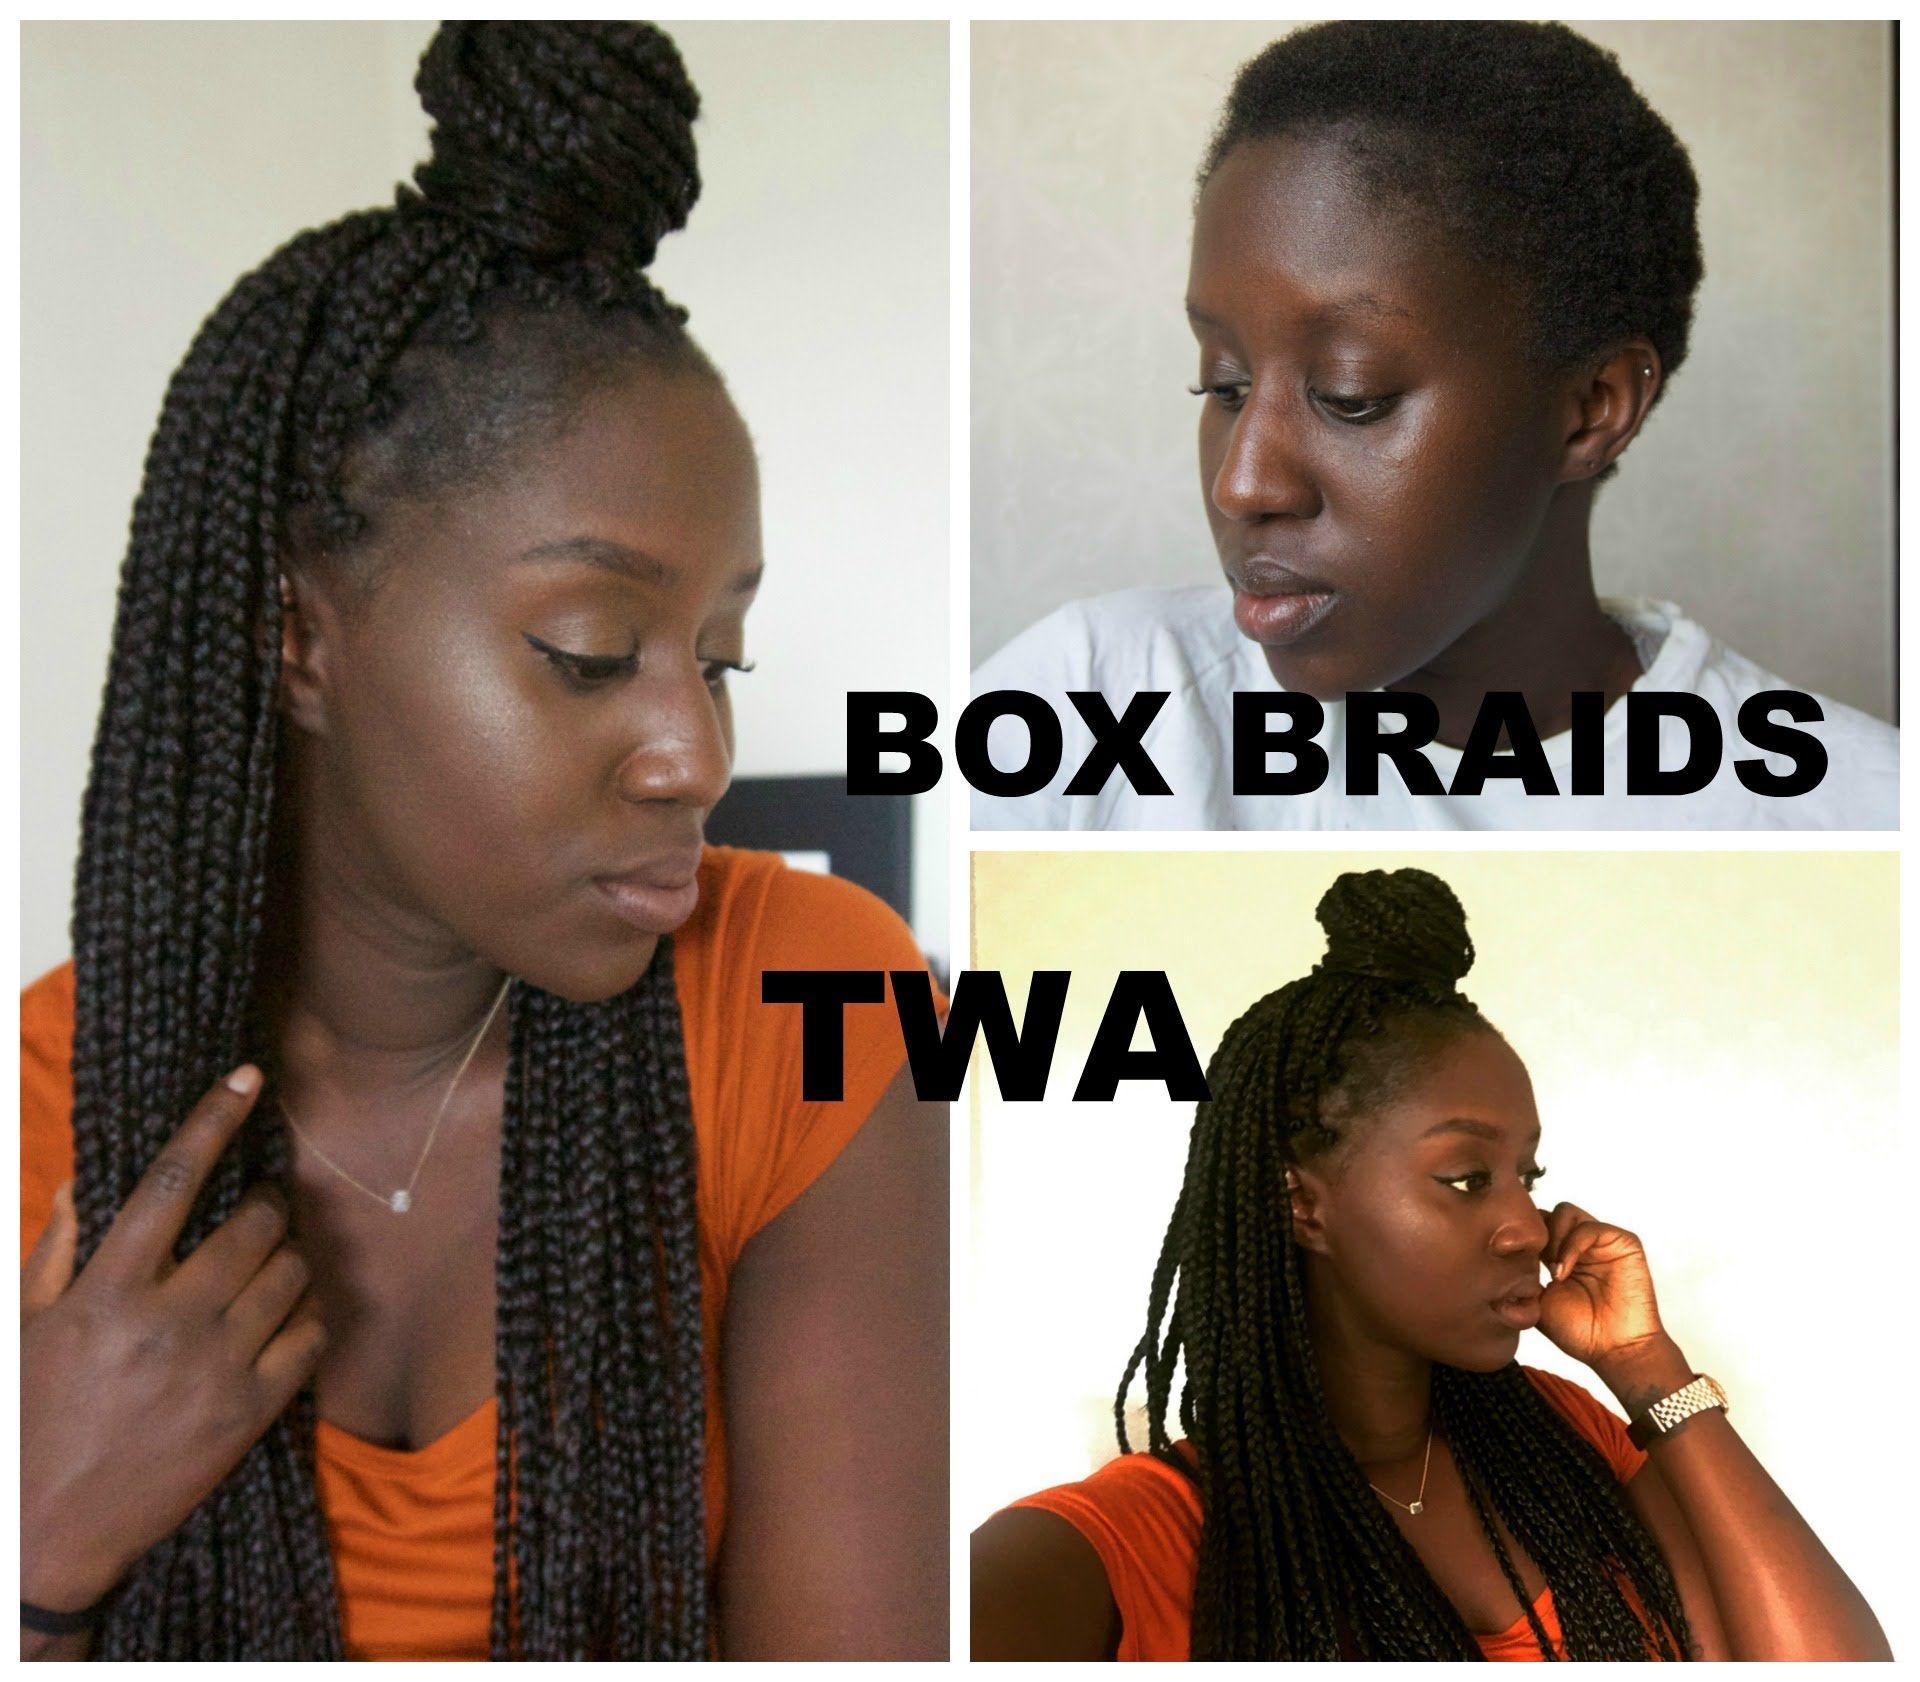 d79dd40874e983774a0ecd322bad66d7 - How Short Can Your Hair Be To Get Box Braids